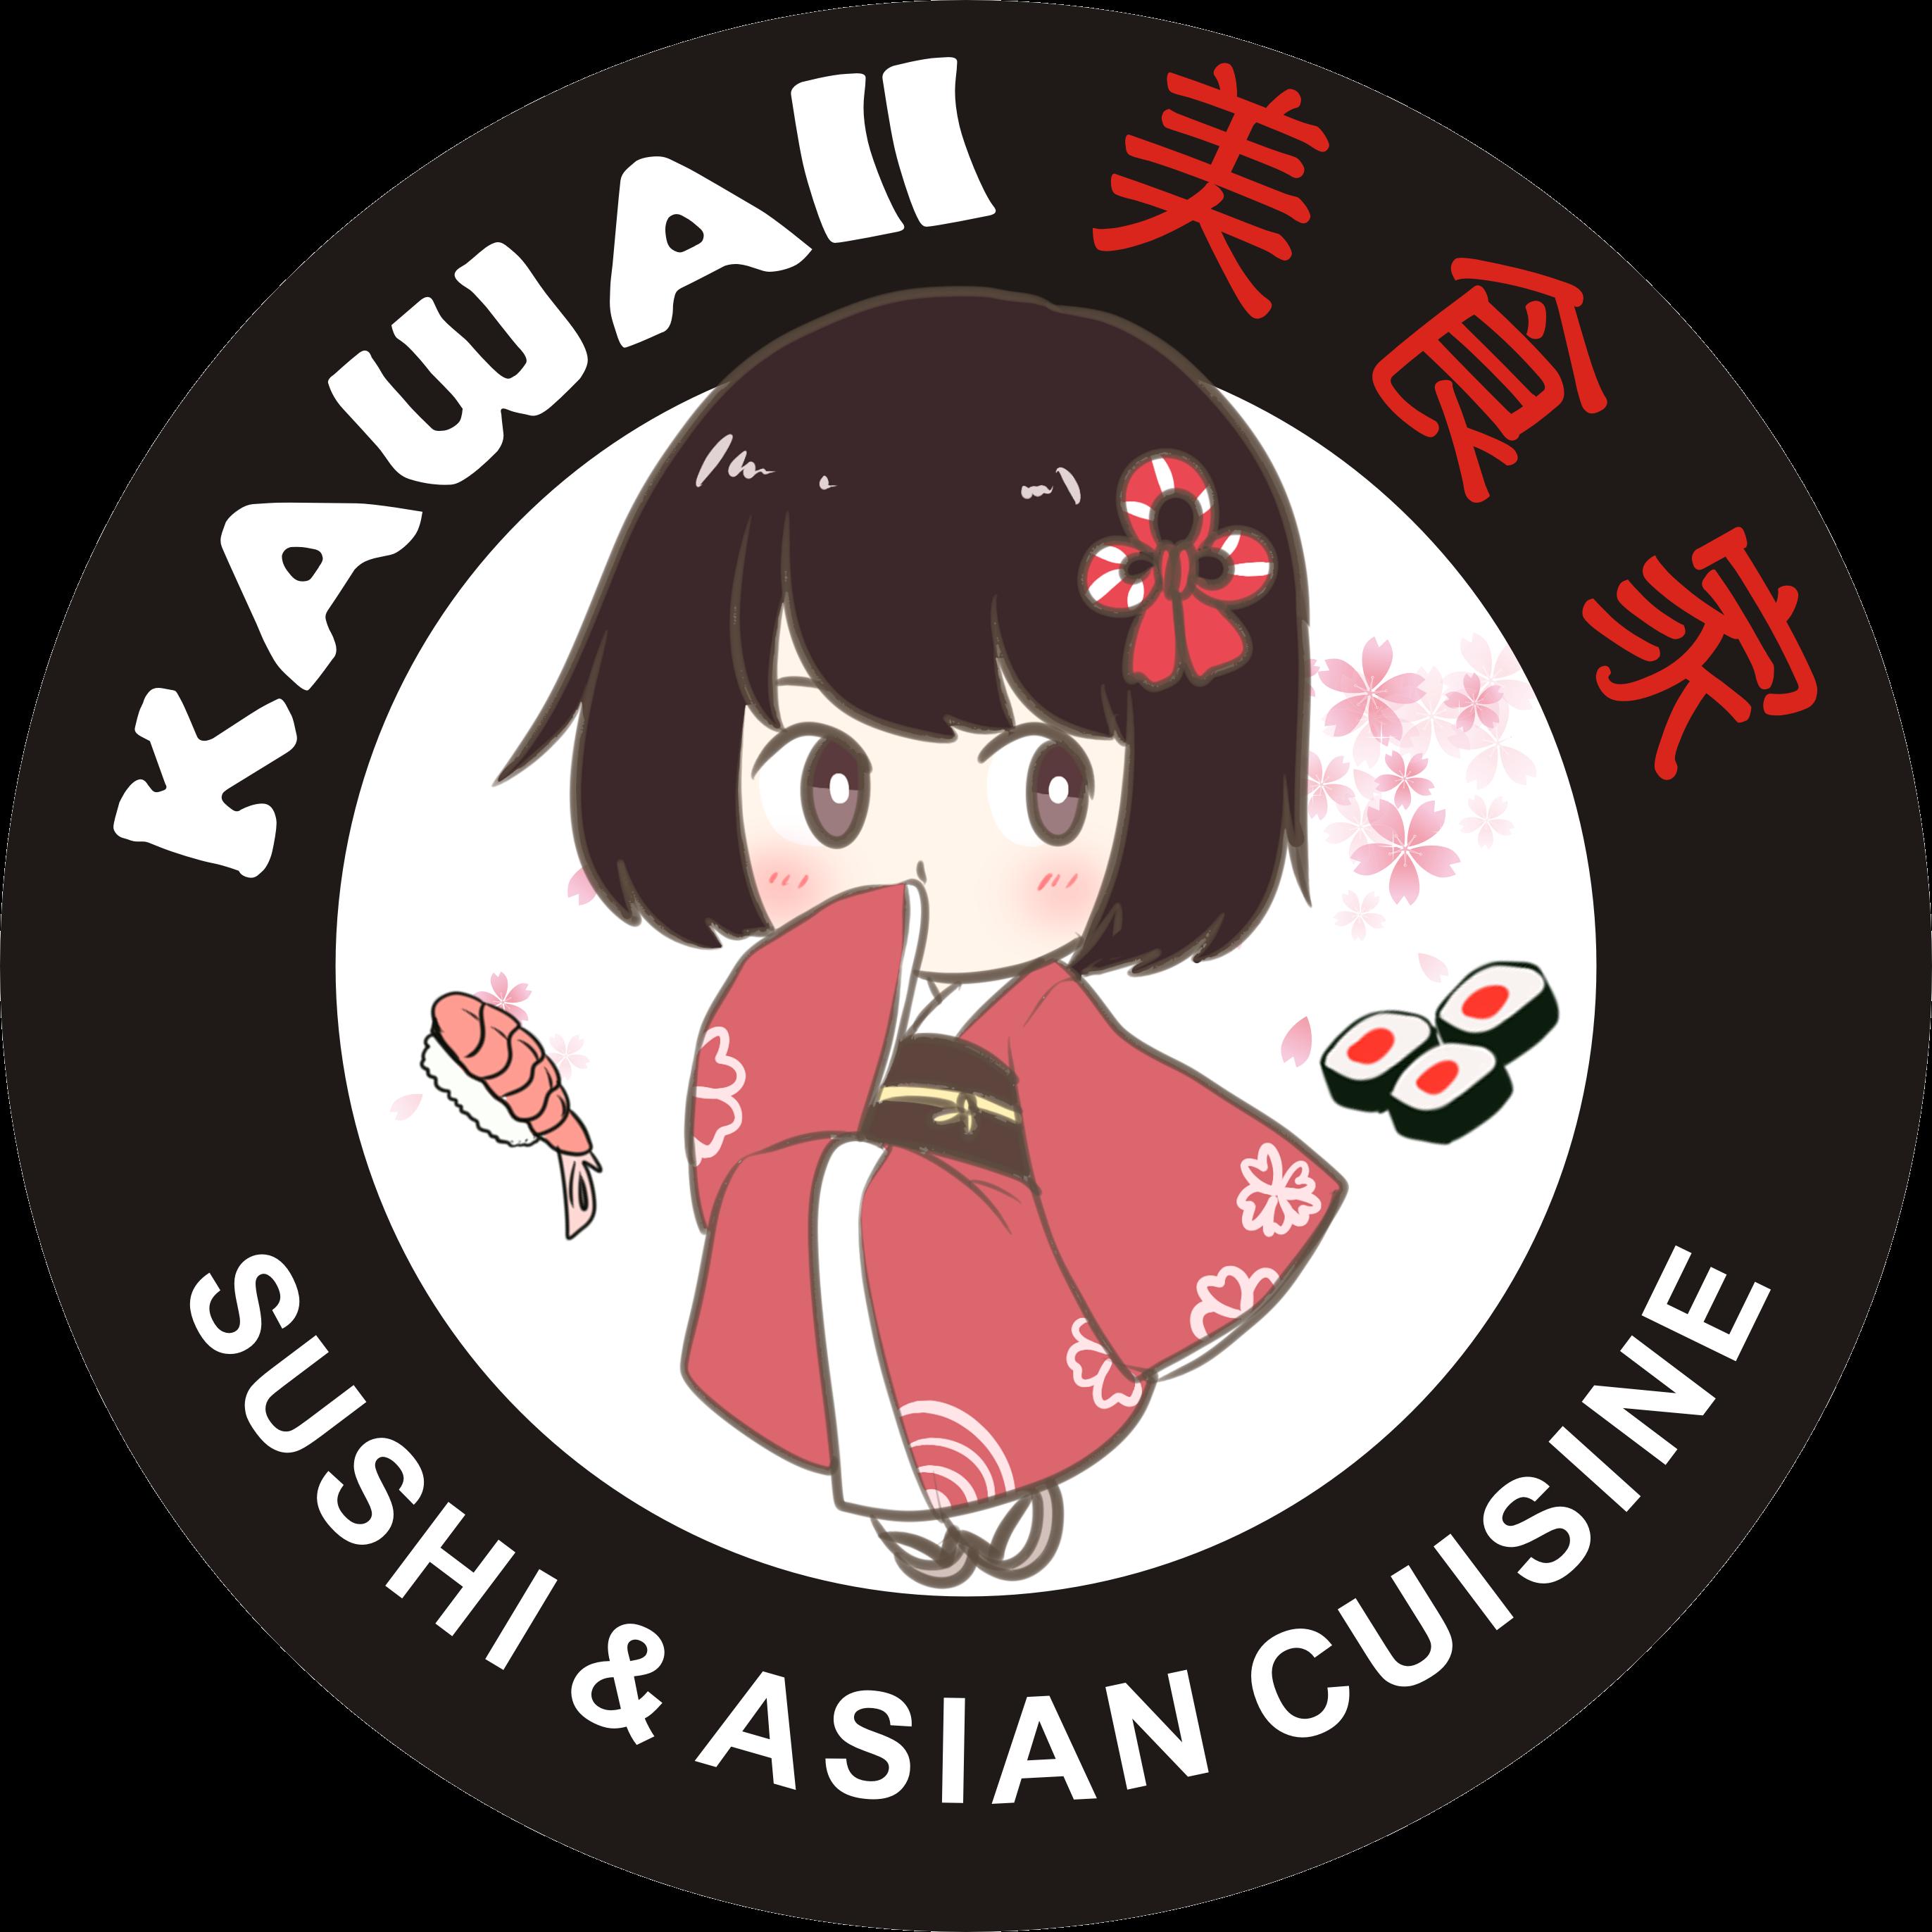 Kawaii Sushi and Asian Cuisine - Glendale